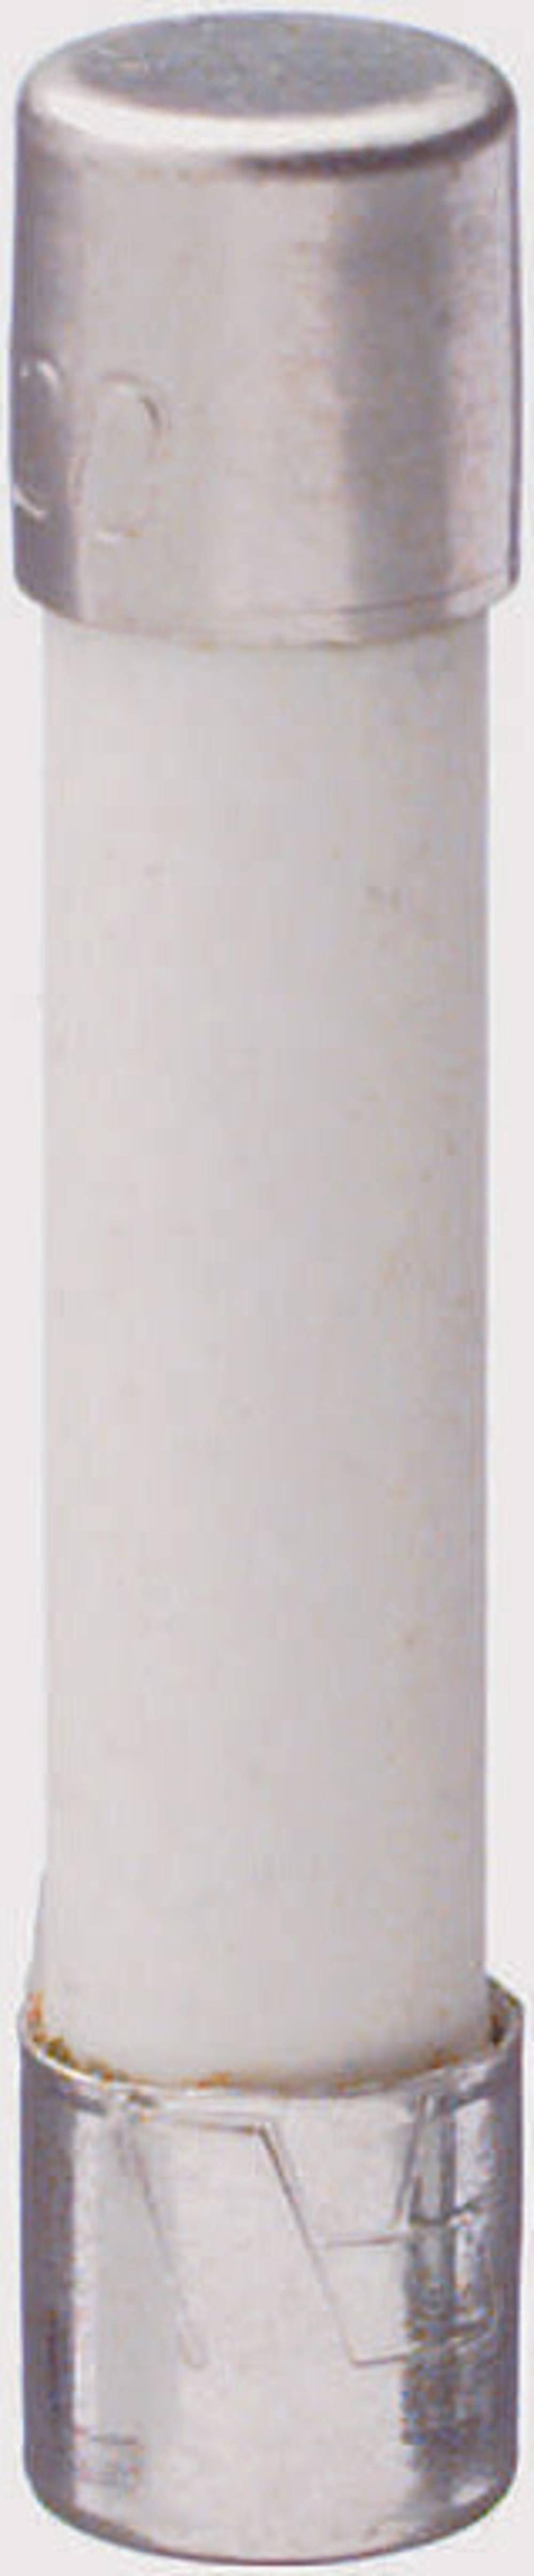 Finsikring (Ø x L) 6.4 mm x 31.8 mm 8 A 250 V Superhurtig -FF- ESKA GBB 8 A Indhold 1 stk